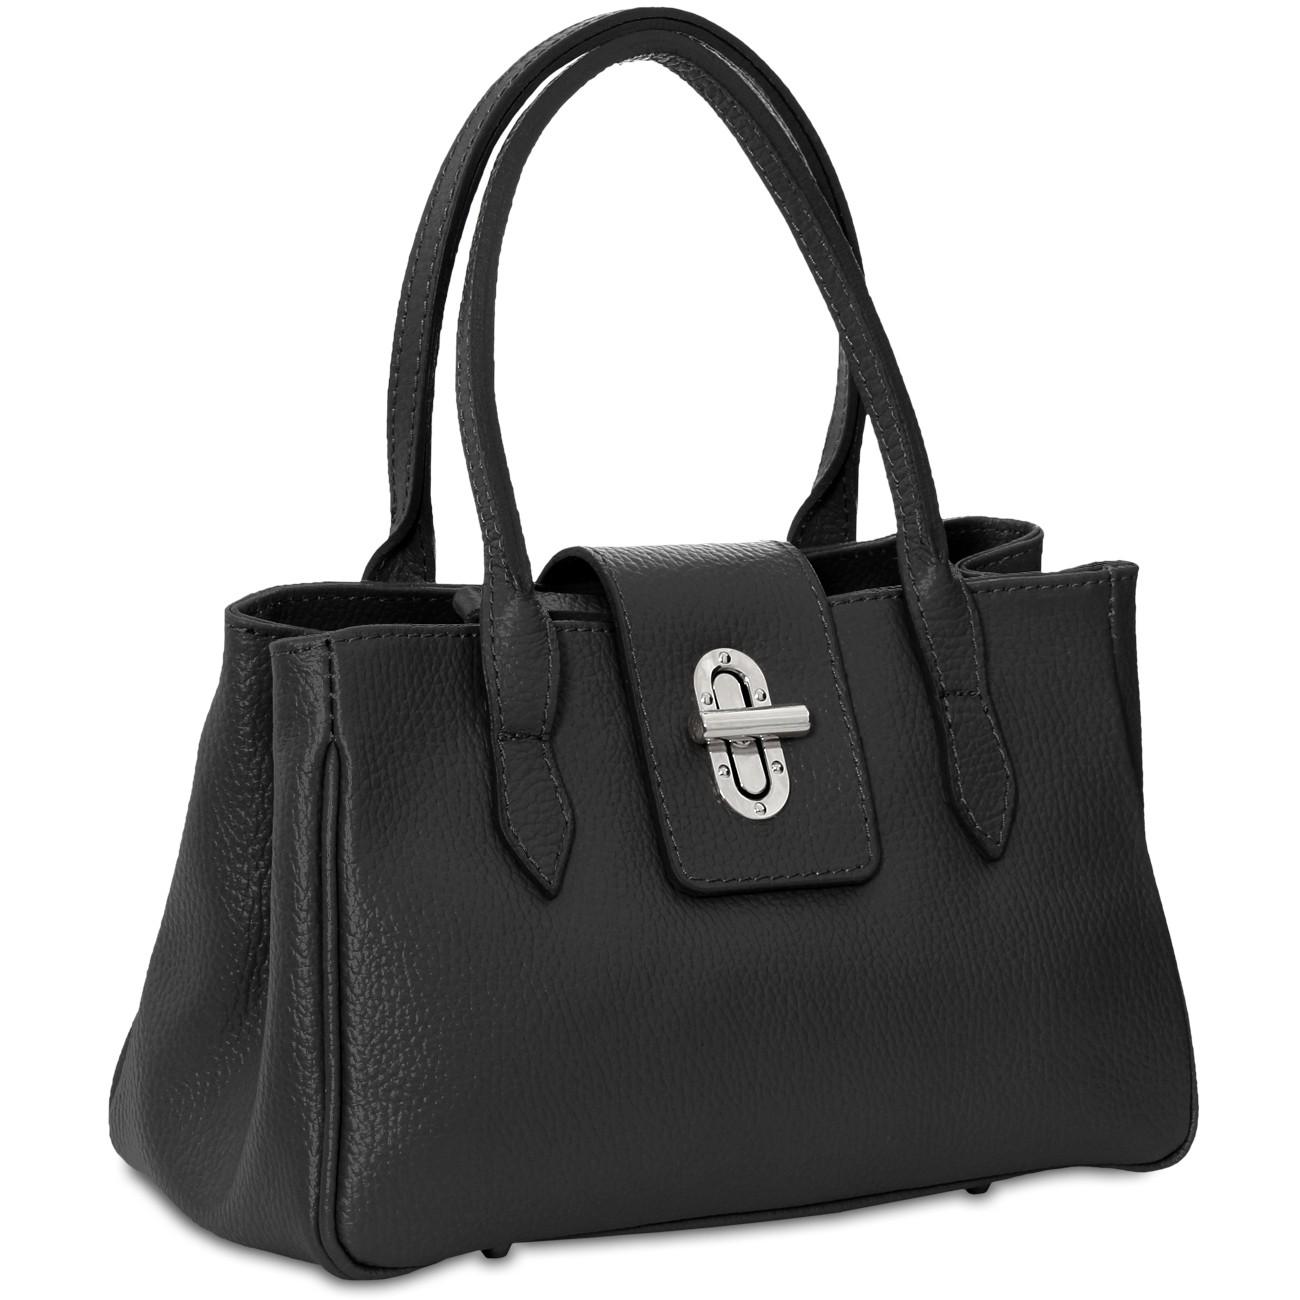 caspar damen kleine leder tasche handtasche. Black Bedroom Furniture Sets. Home Design Ideas